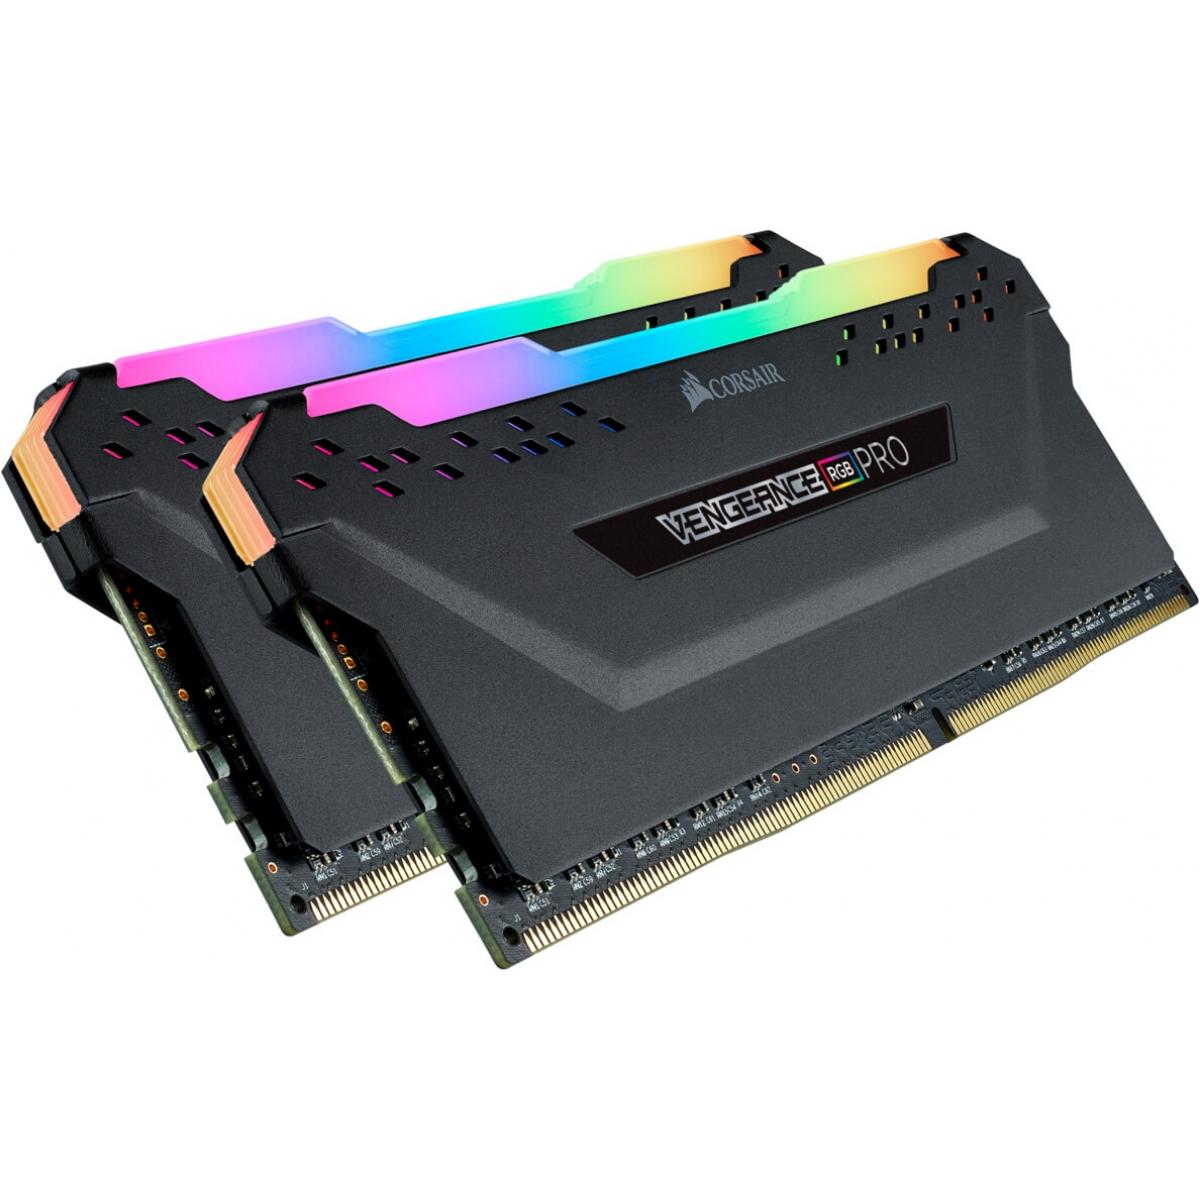 Memória DDR4 Corsair Vengeance RGB Pro, 32GB (2x16GB) 3466MHz, CMW32GX4M2C3466C16